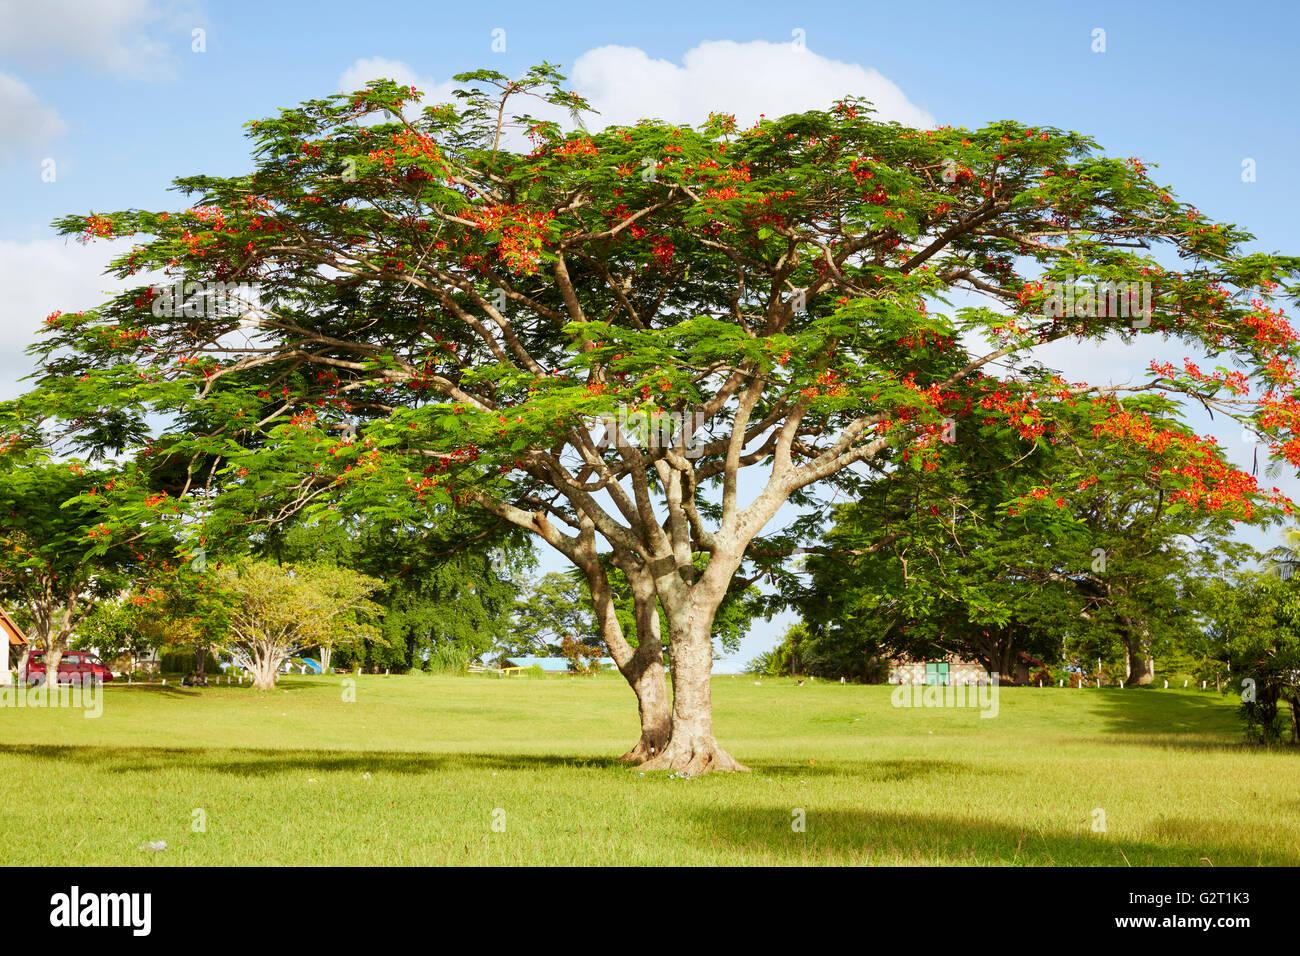 Royal poinciana (Delonix Regia), Port Vila, Efate Island, Vanuatu - Stock Image